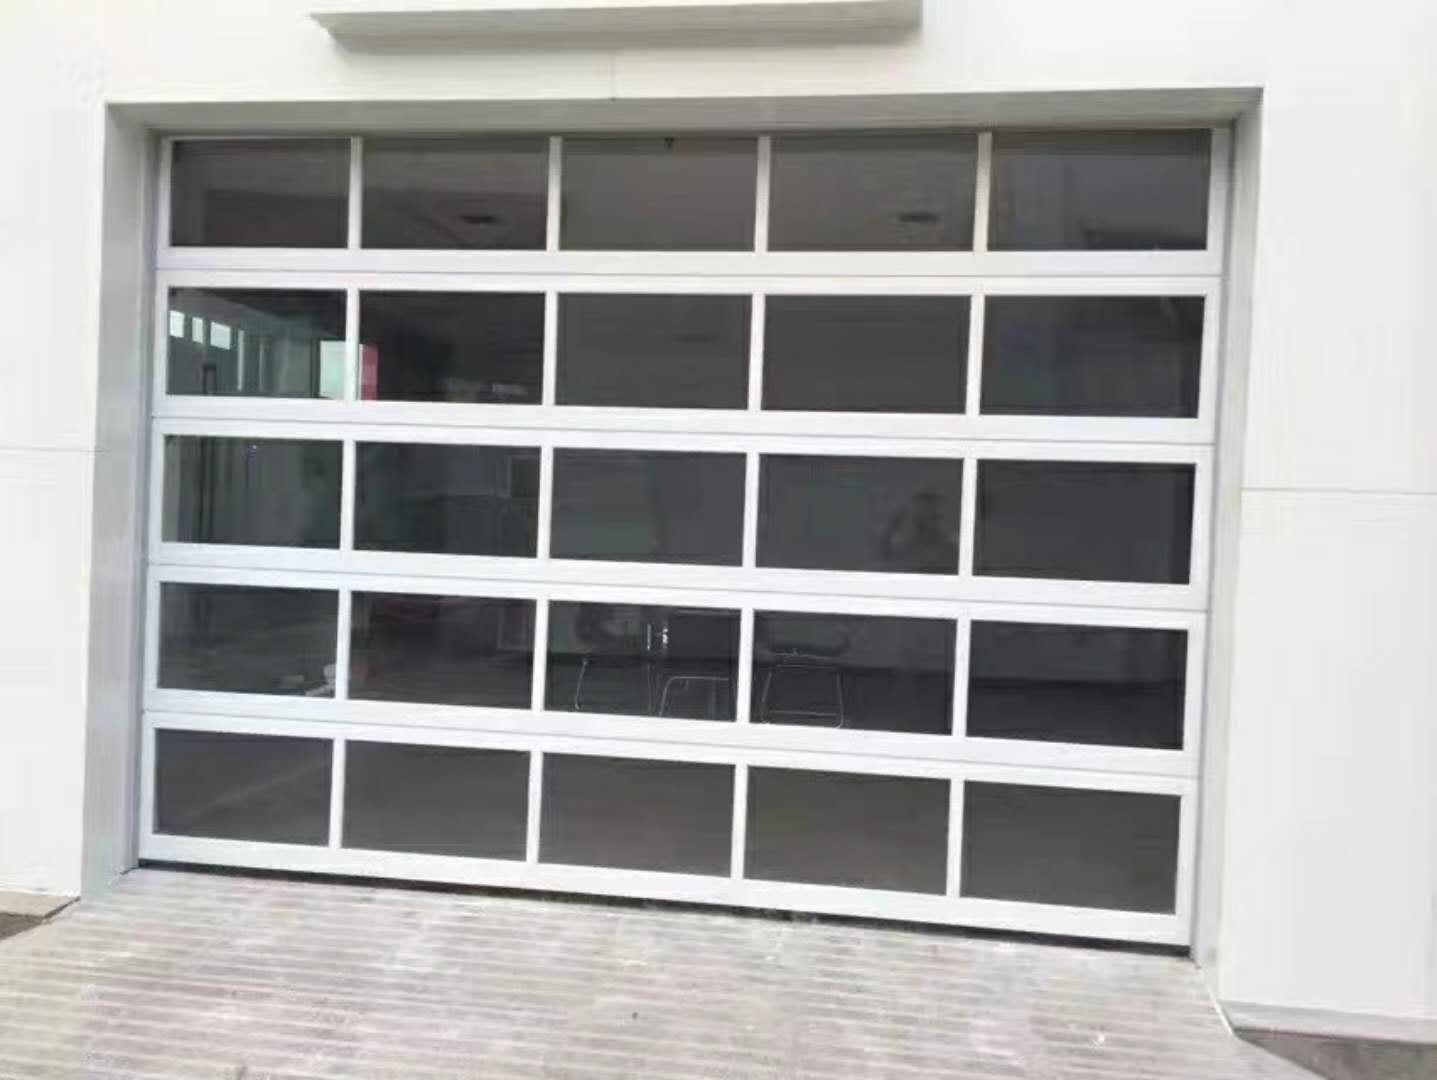 4S店透视门